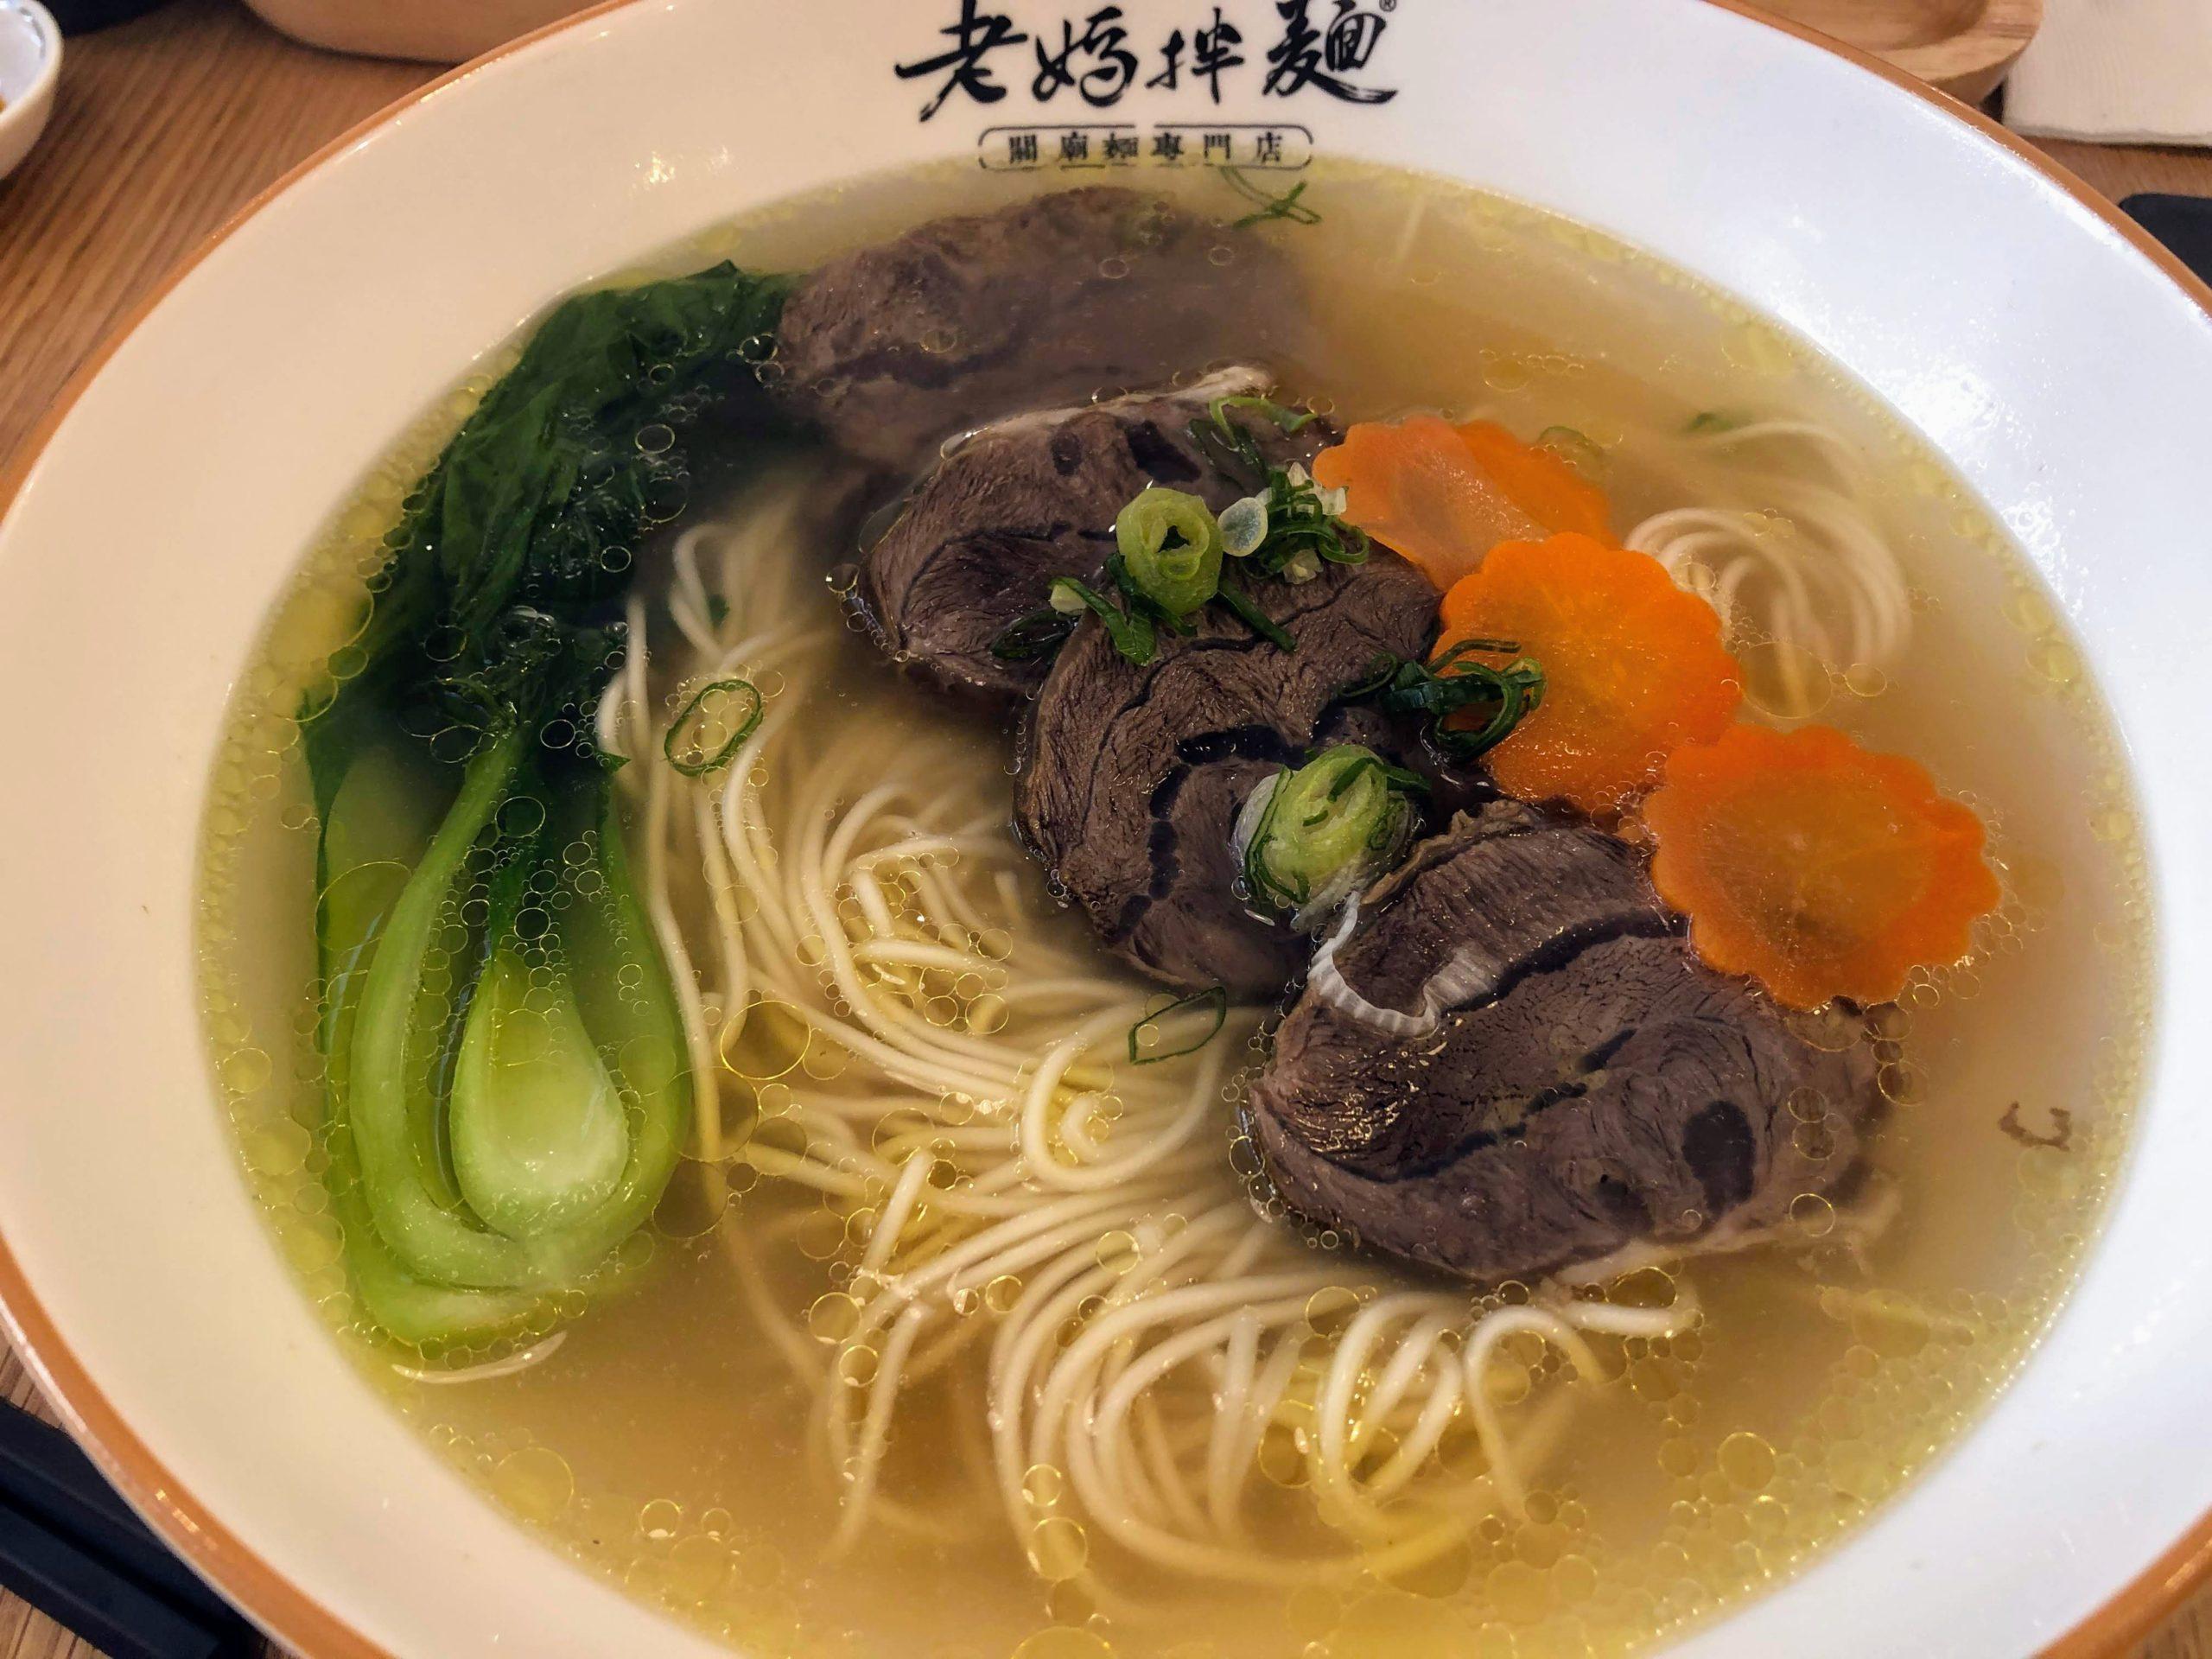 老媽拌麺関廟麺専門店の牛肉麺